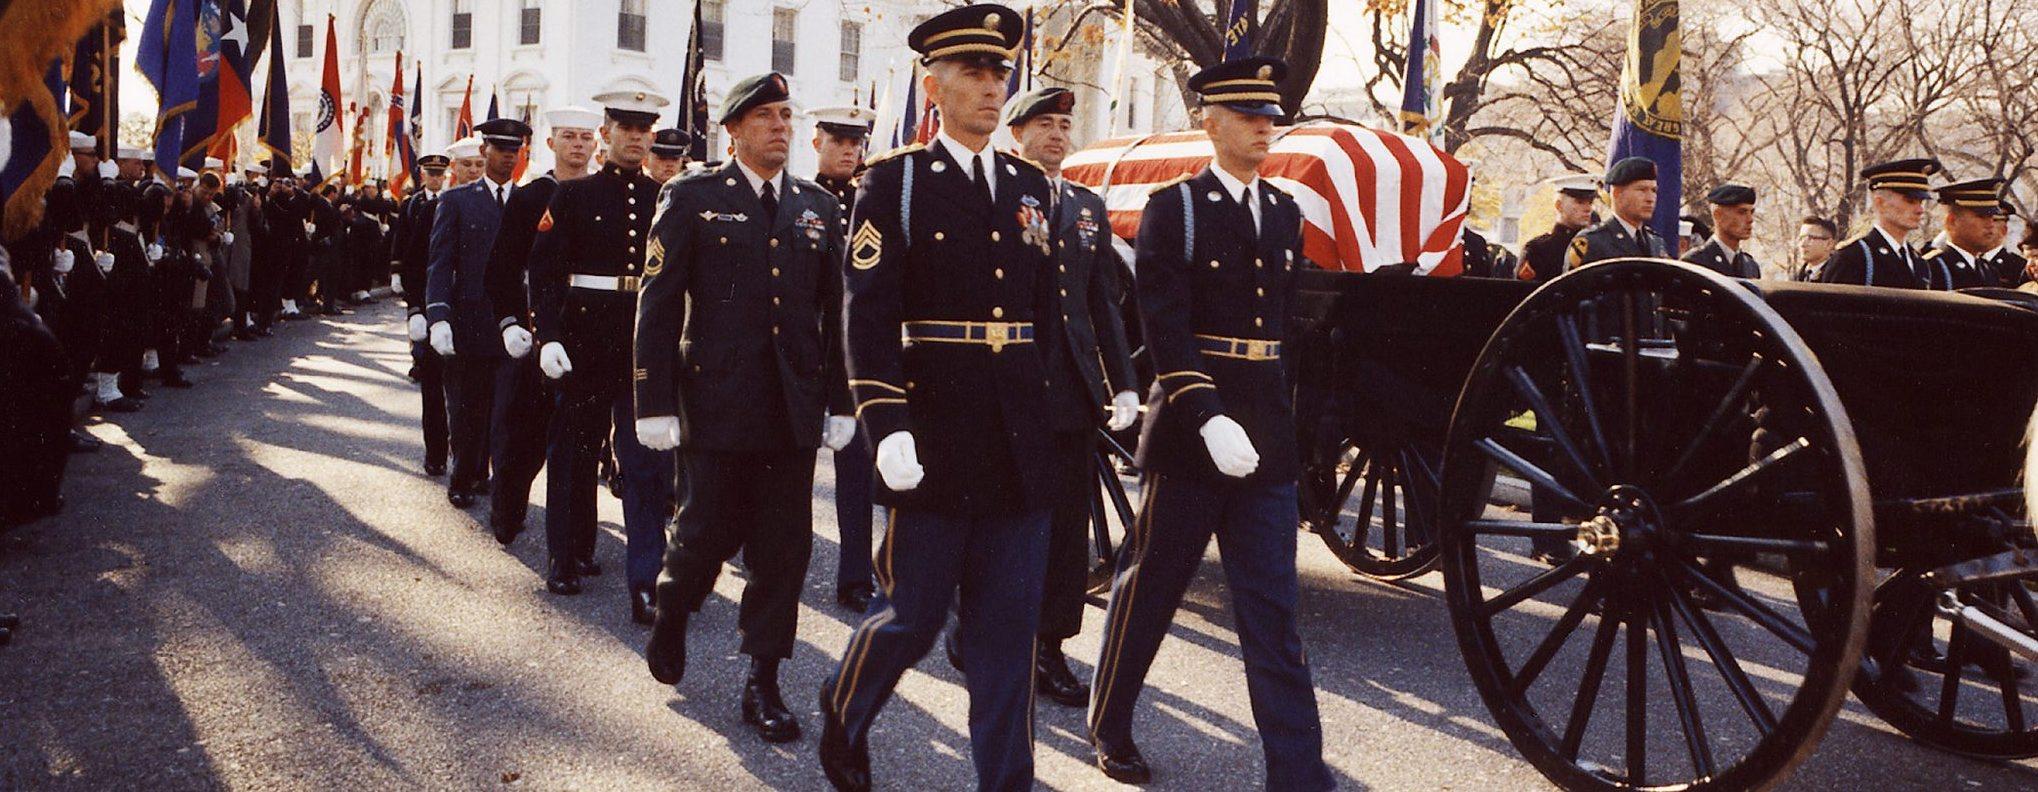 I funerali di JFK